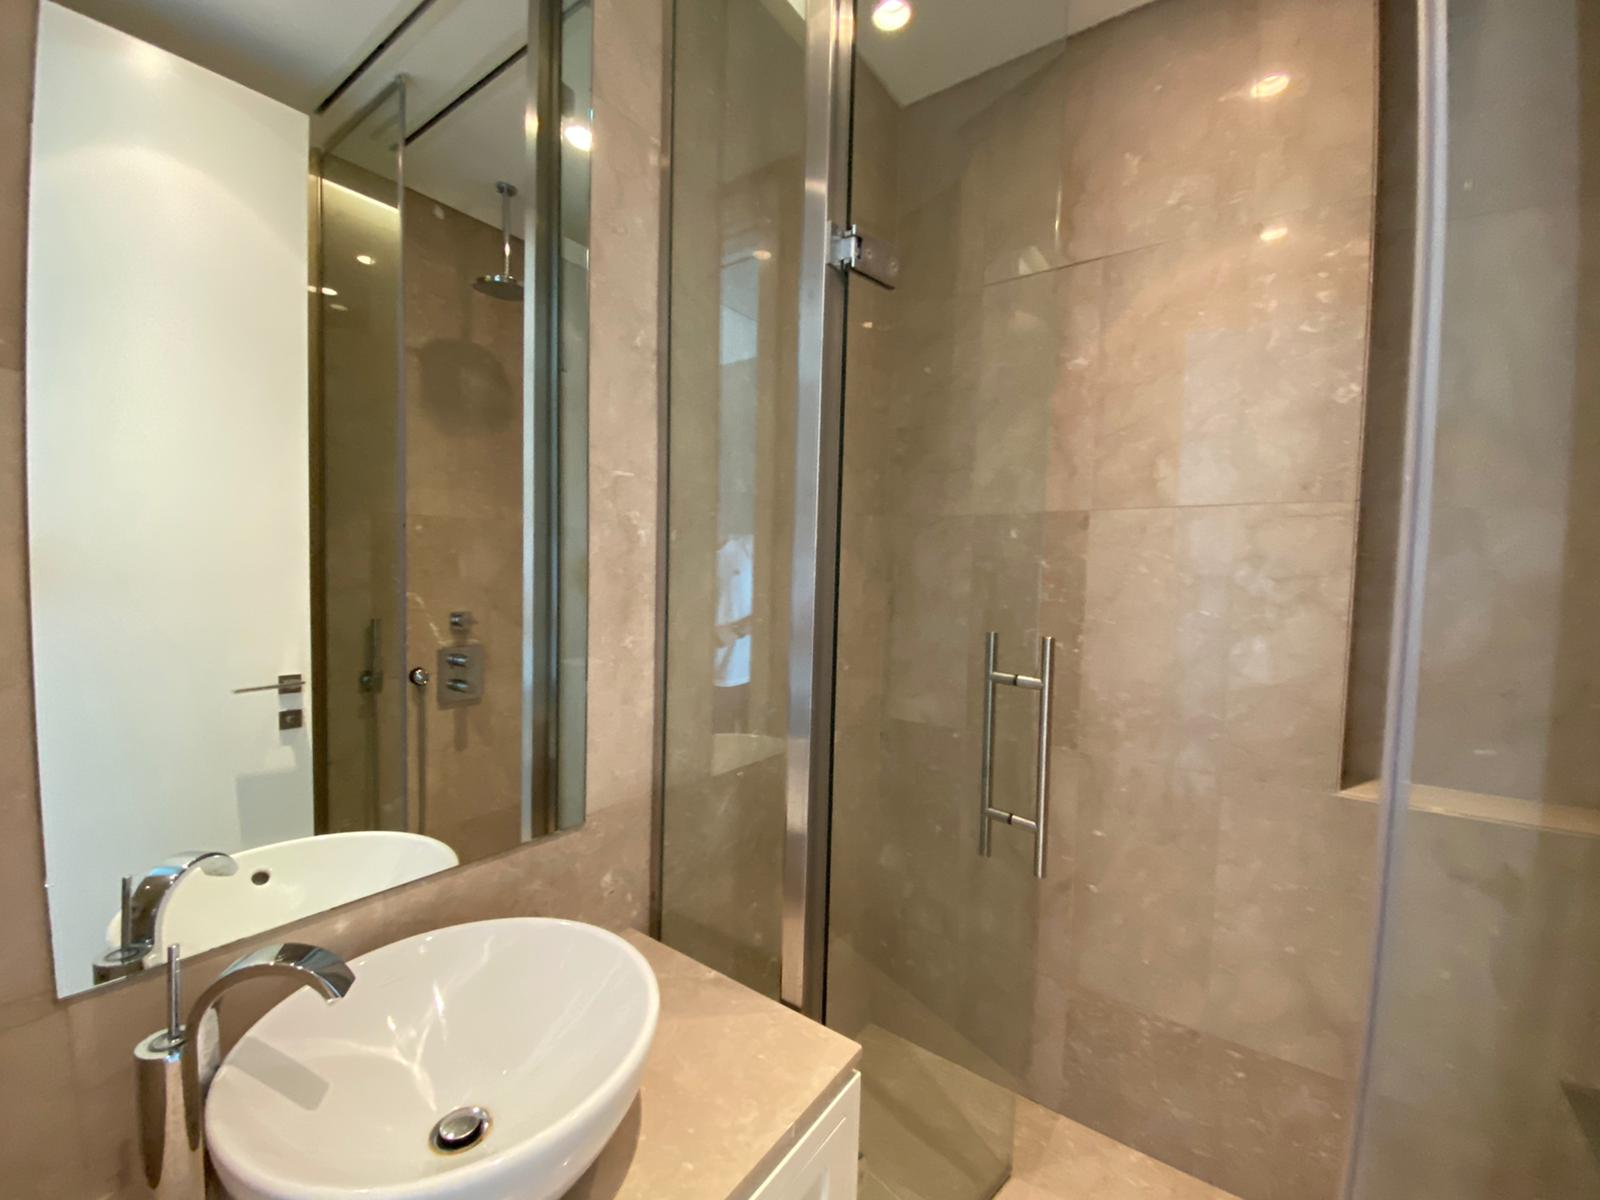 penthouse-istanbul-sapphire-tower-42th-floor-016.jpg